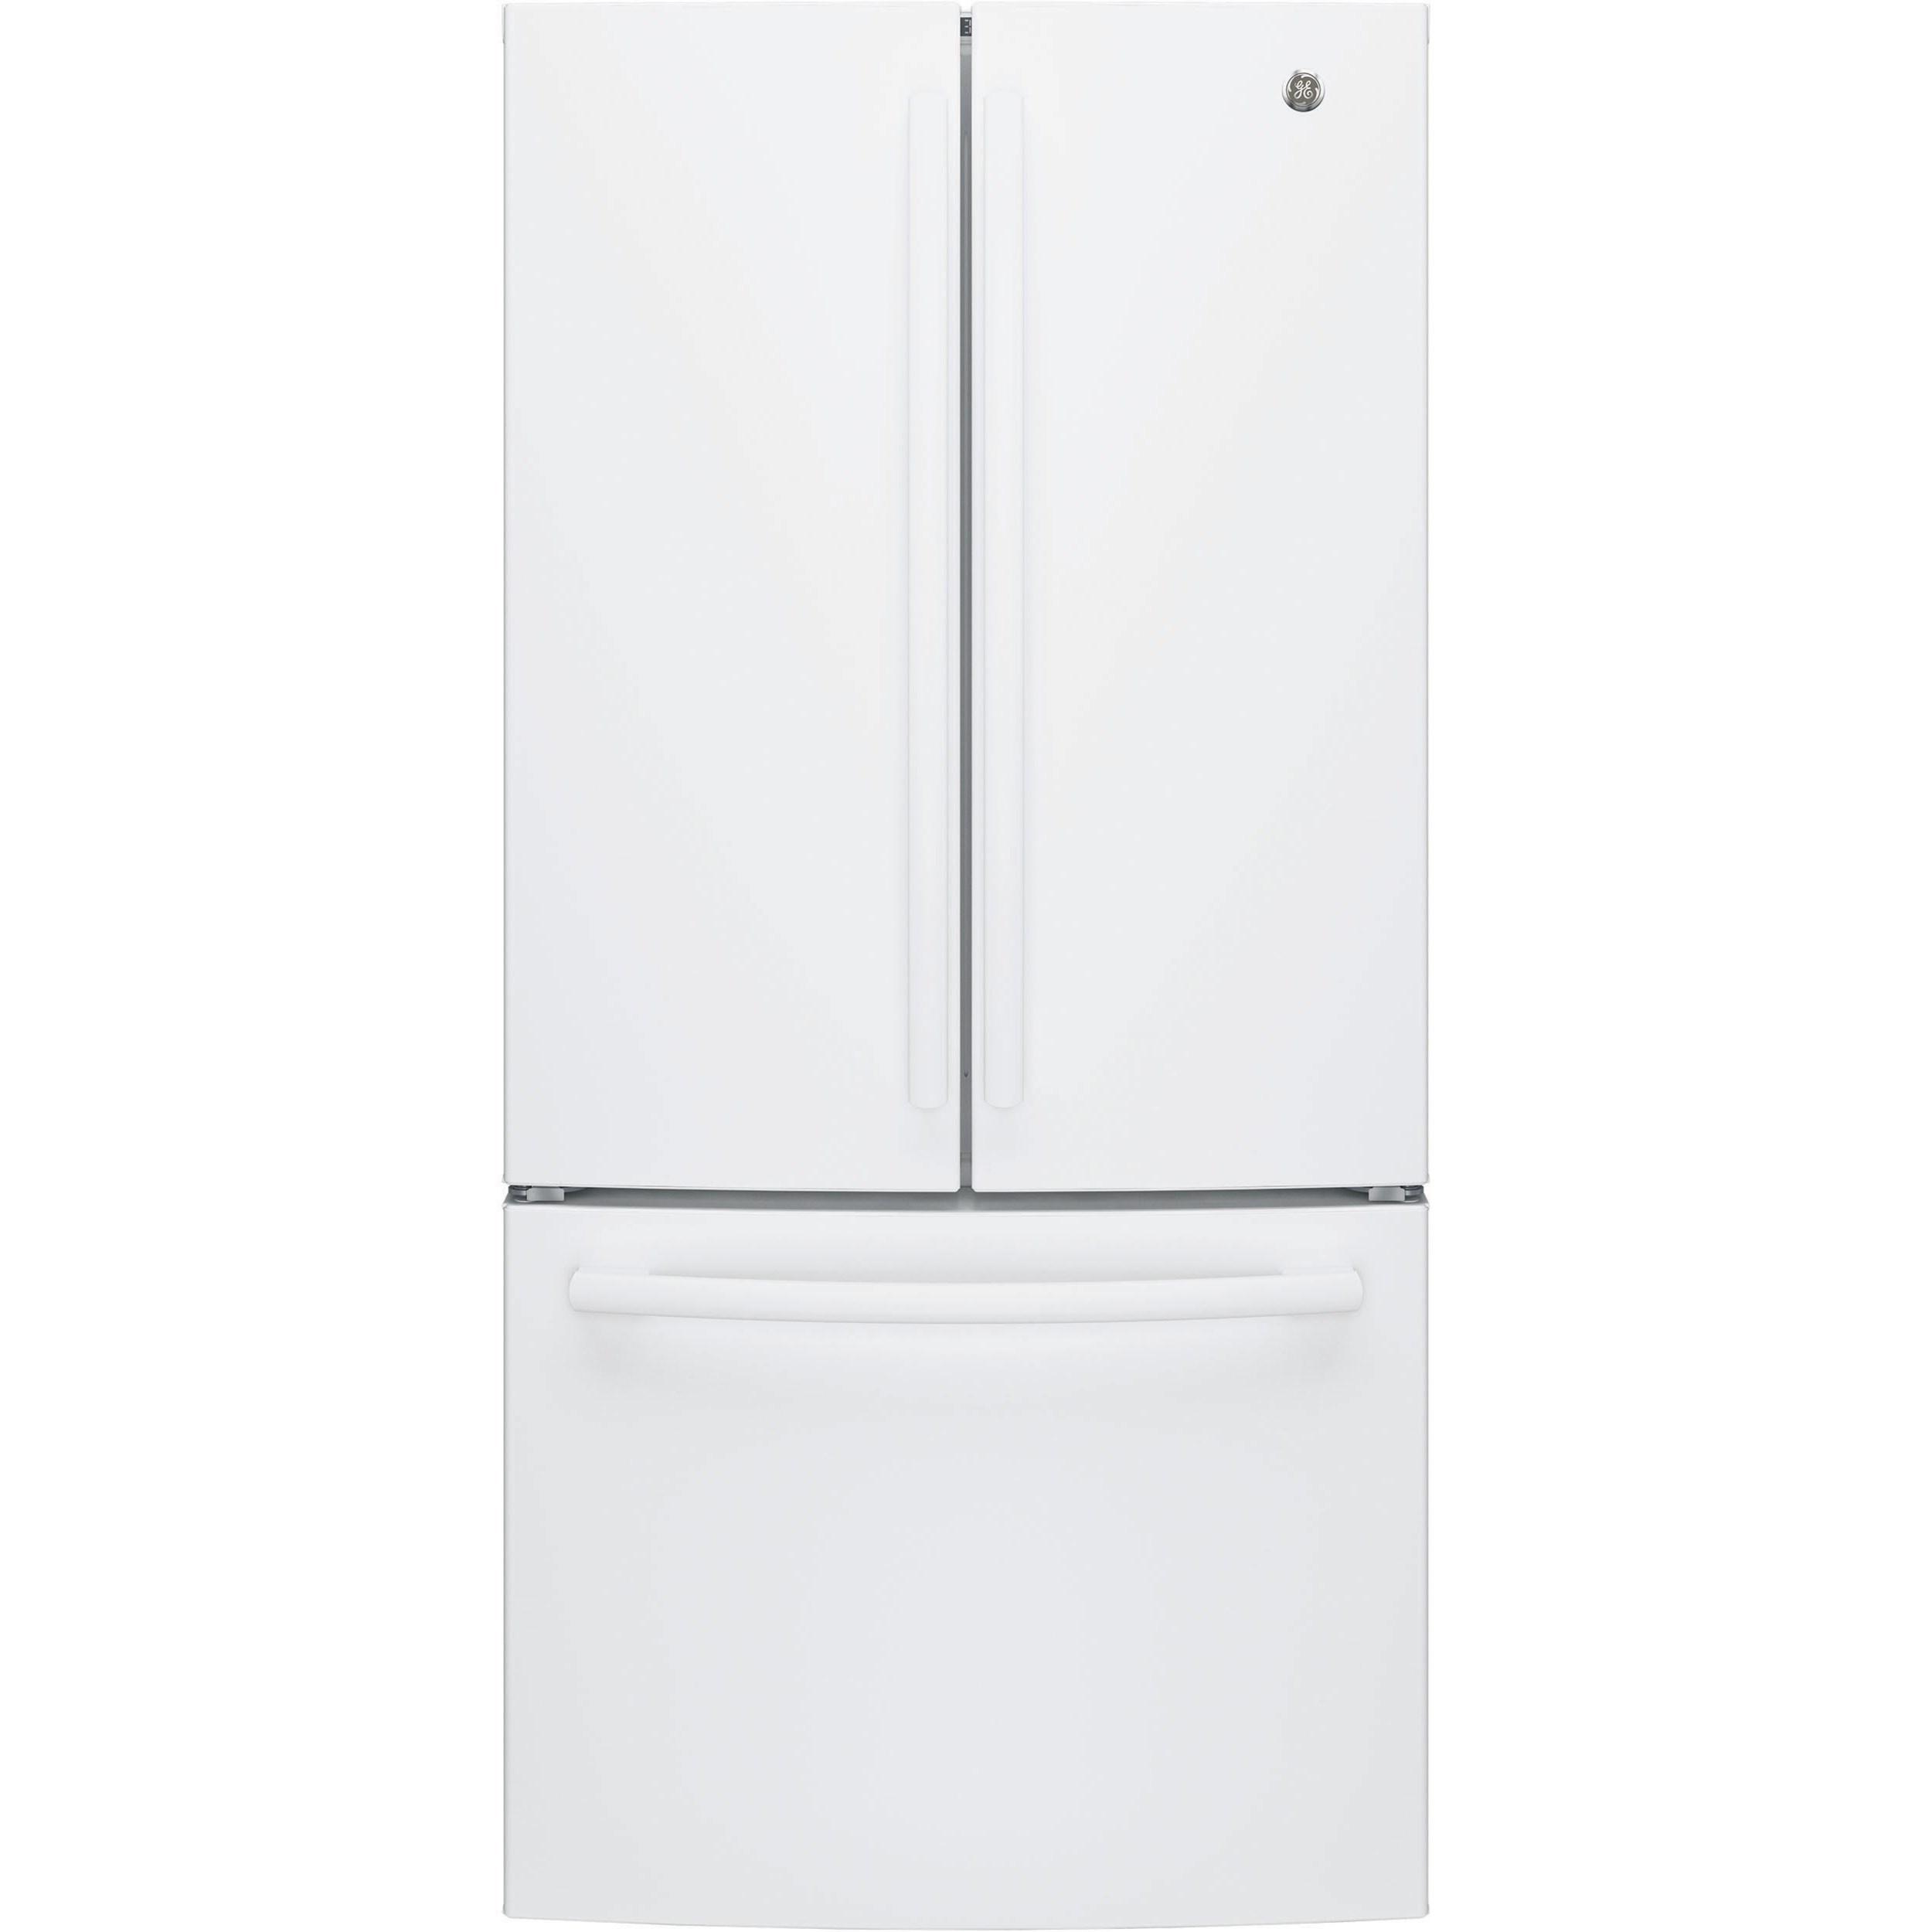 Ge Appliances Ge Series Energy Star 248 Cu Ft French Door